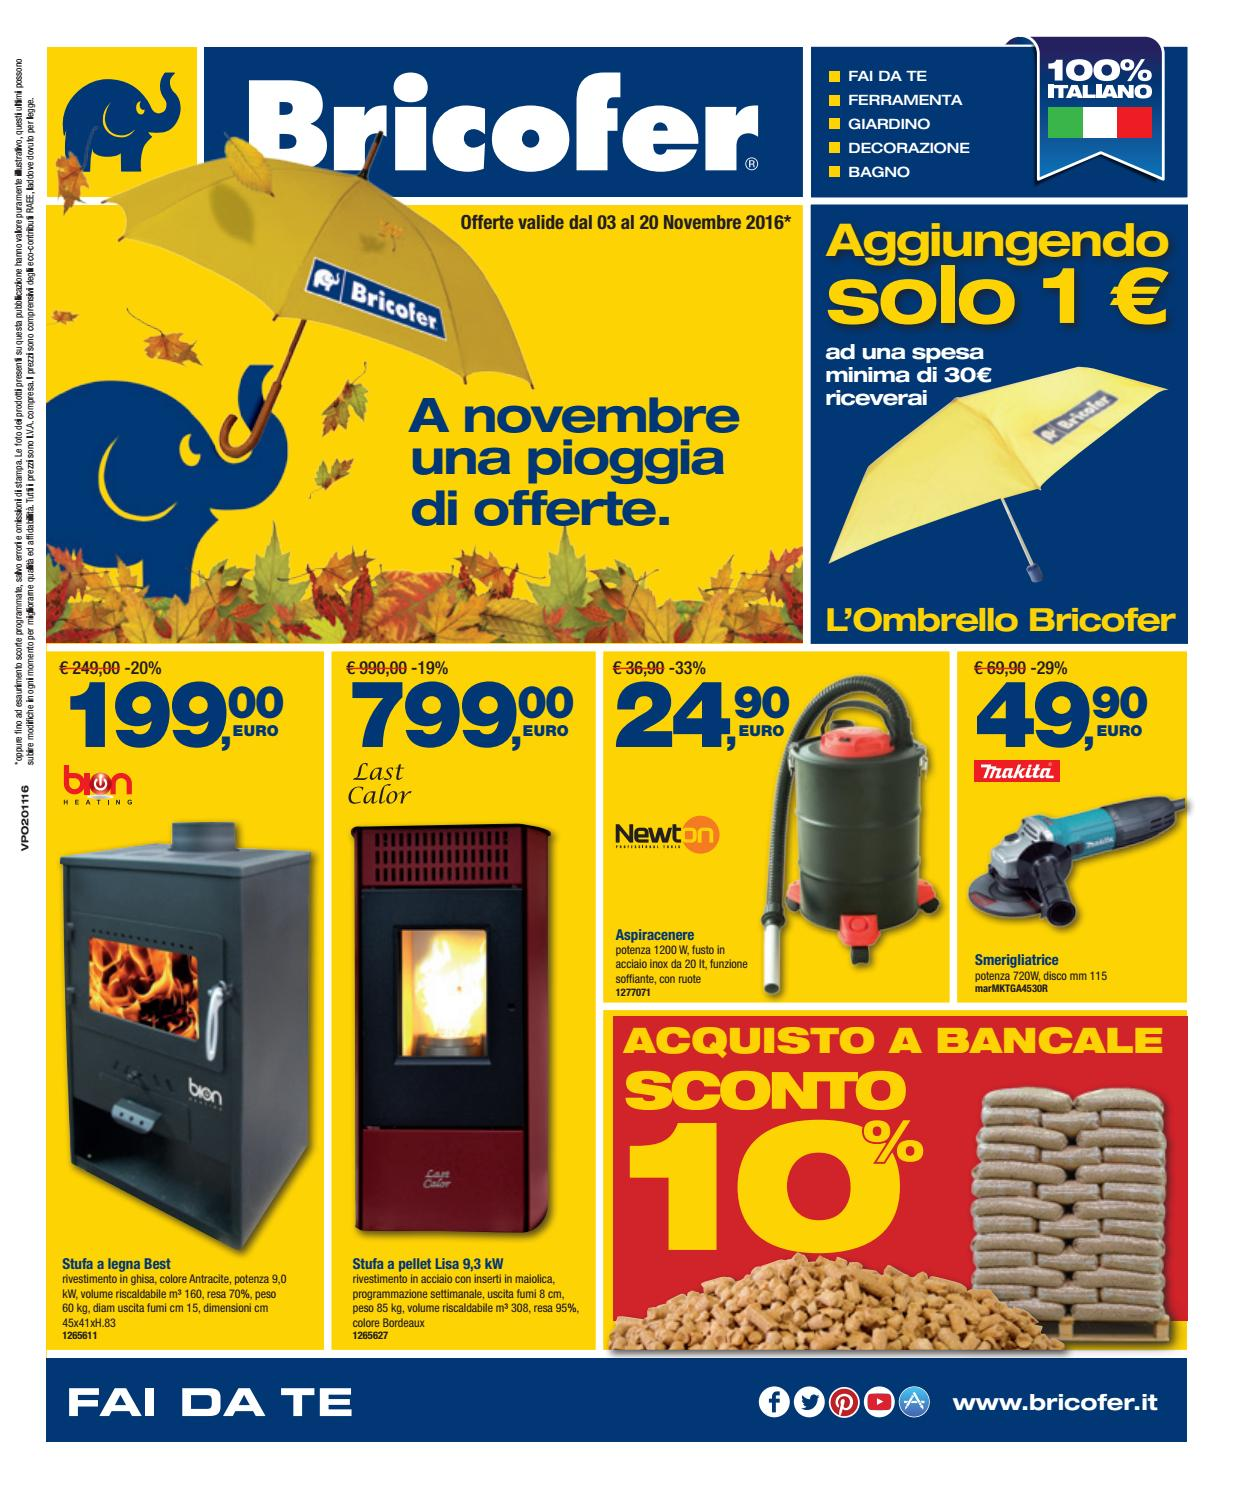 Volantino bricofer aversa novembre 2016 by bricofer aversa for Volantino bricofer